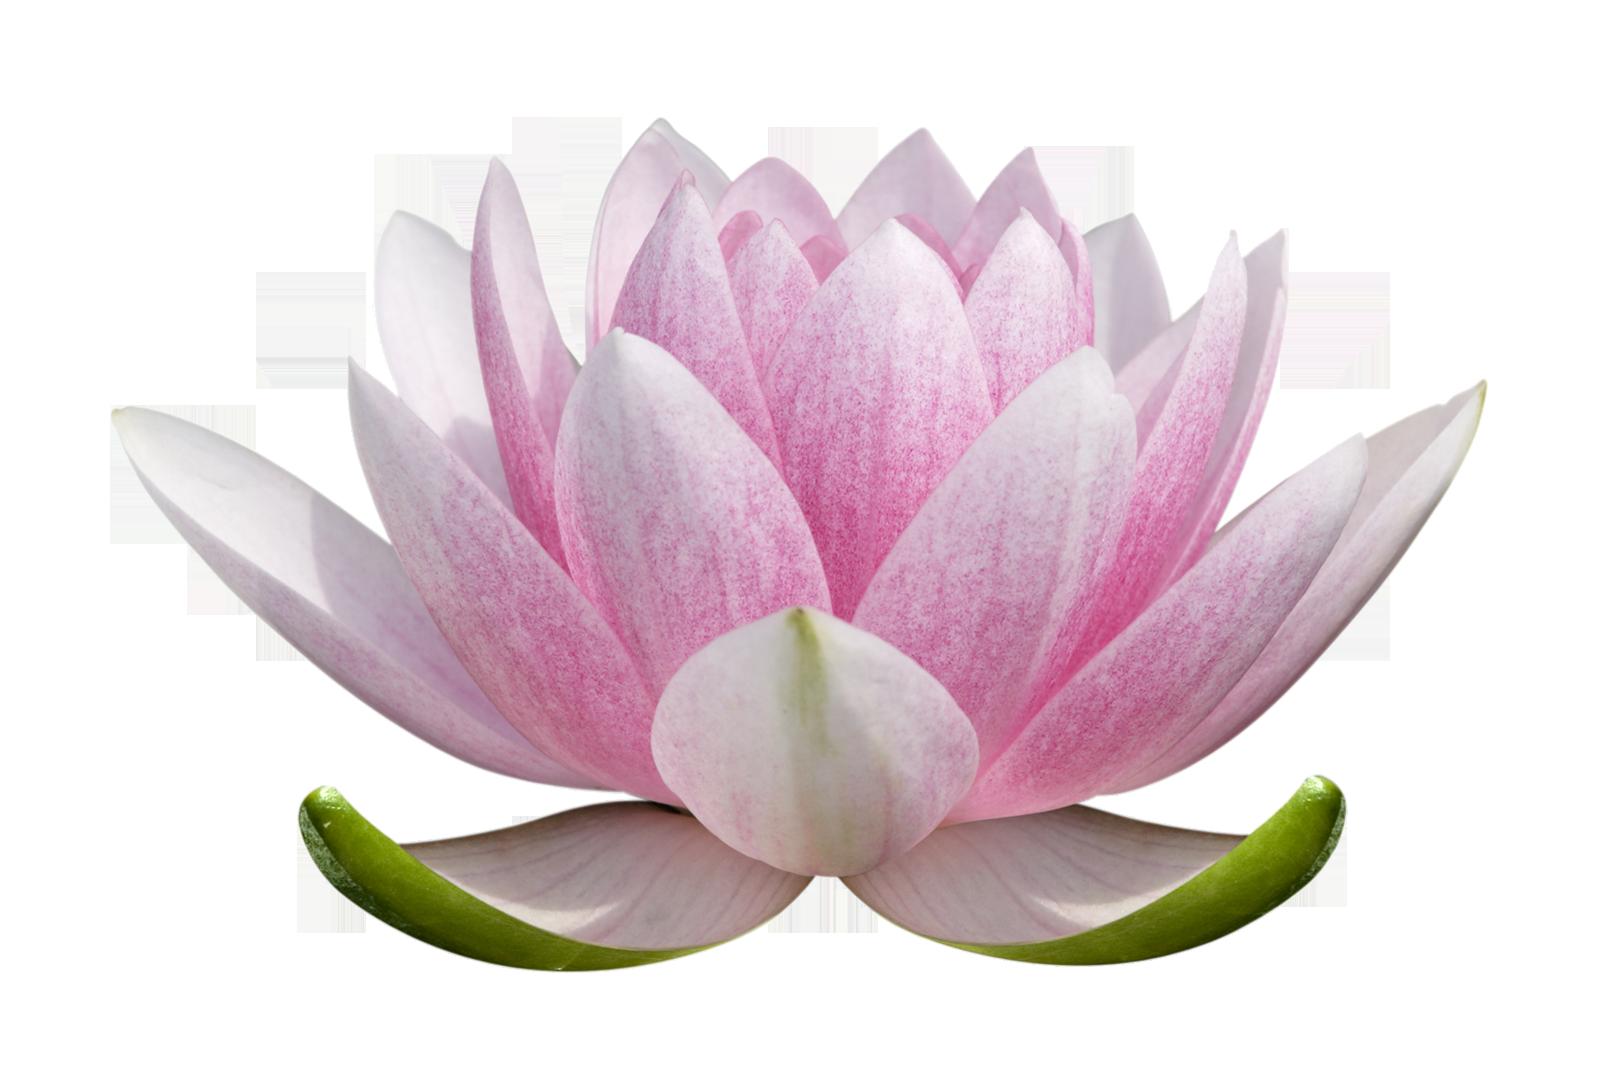 Images free download beautiful. Lotus flower png